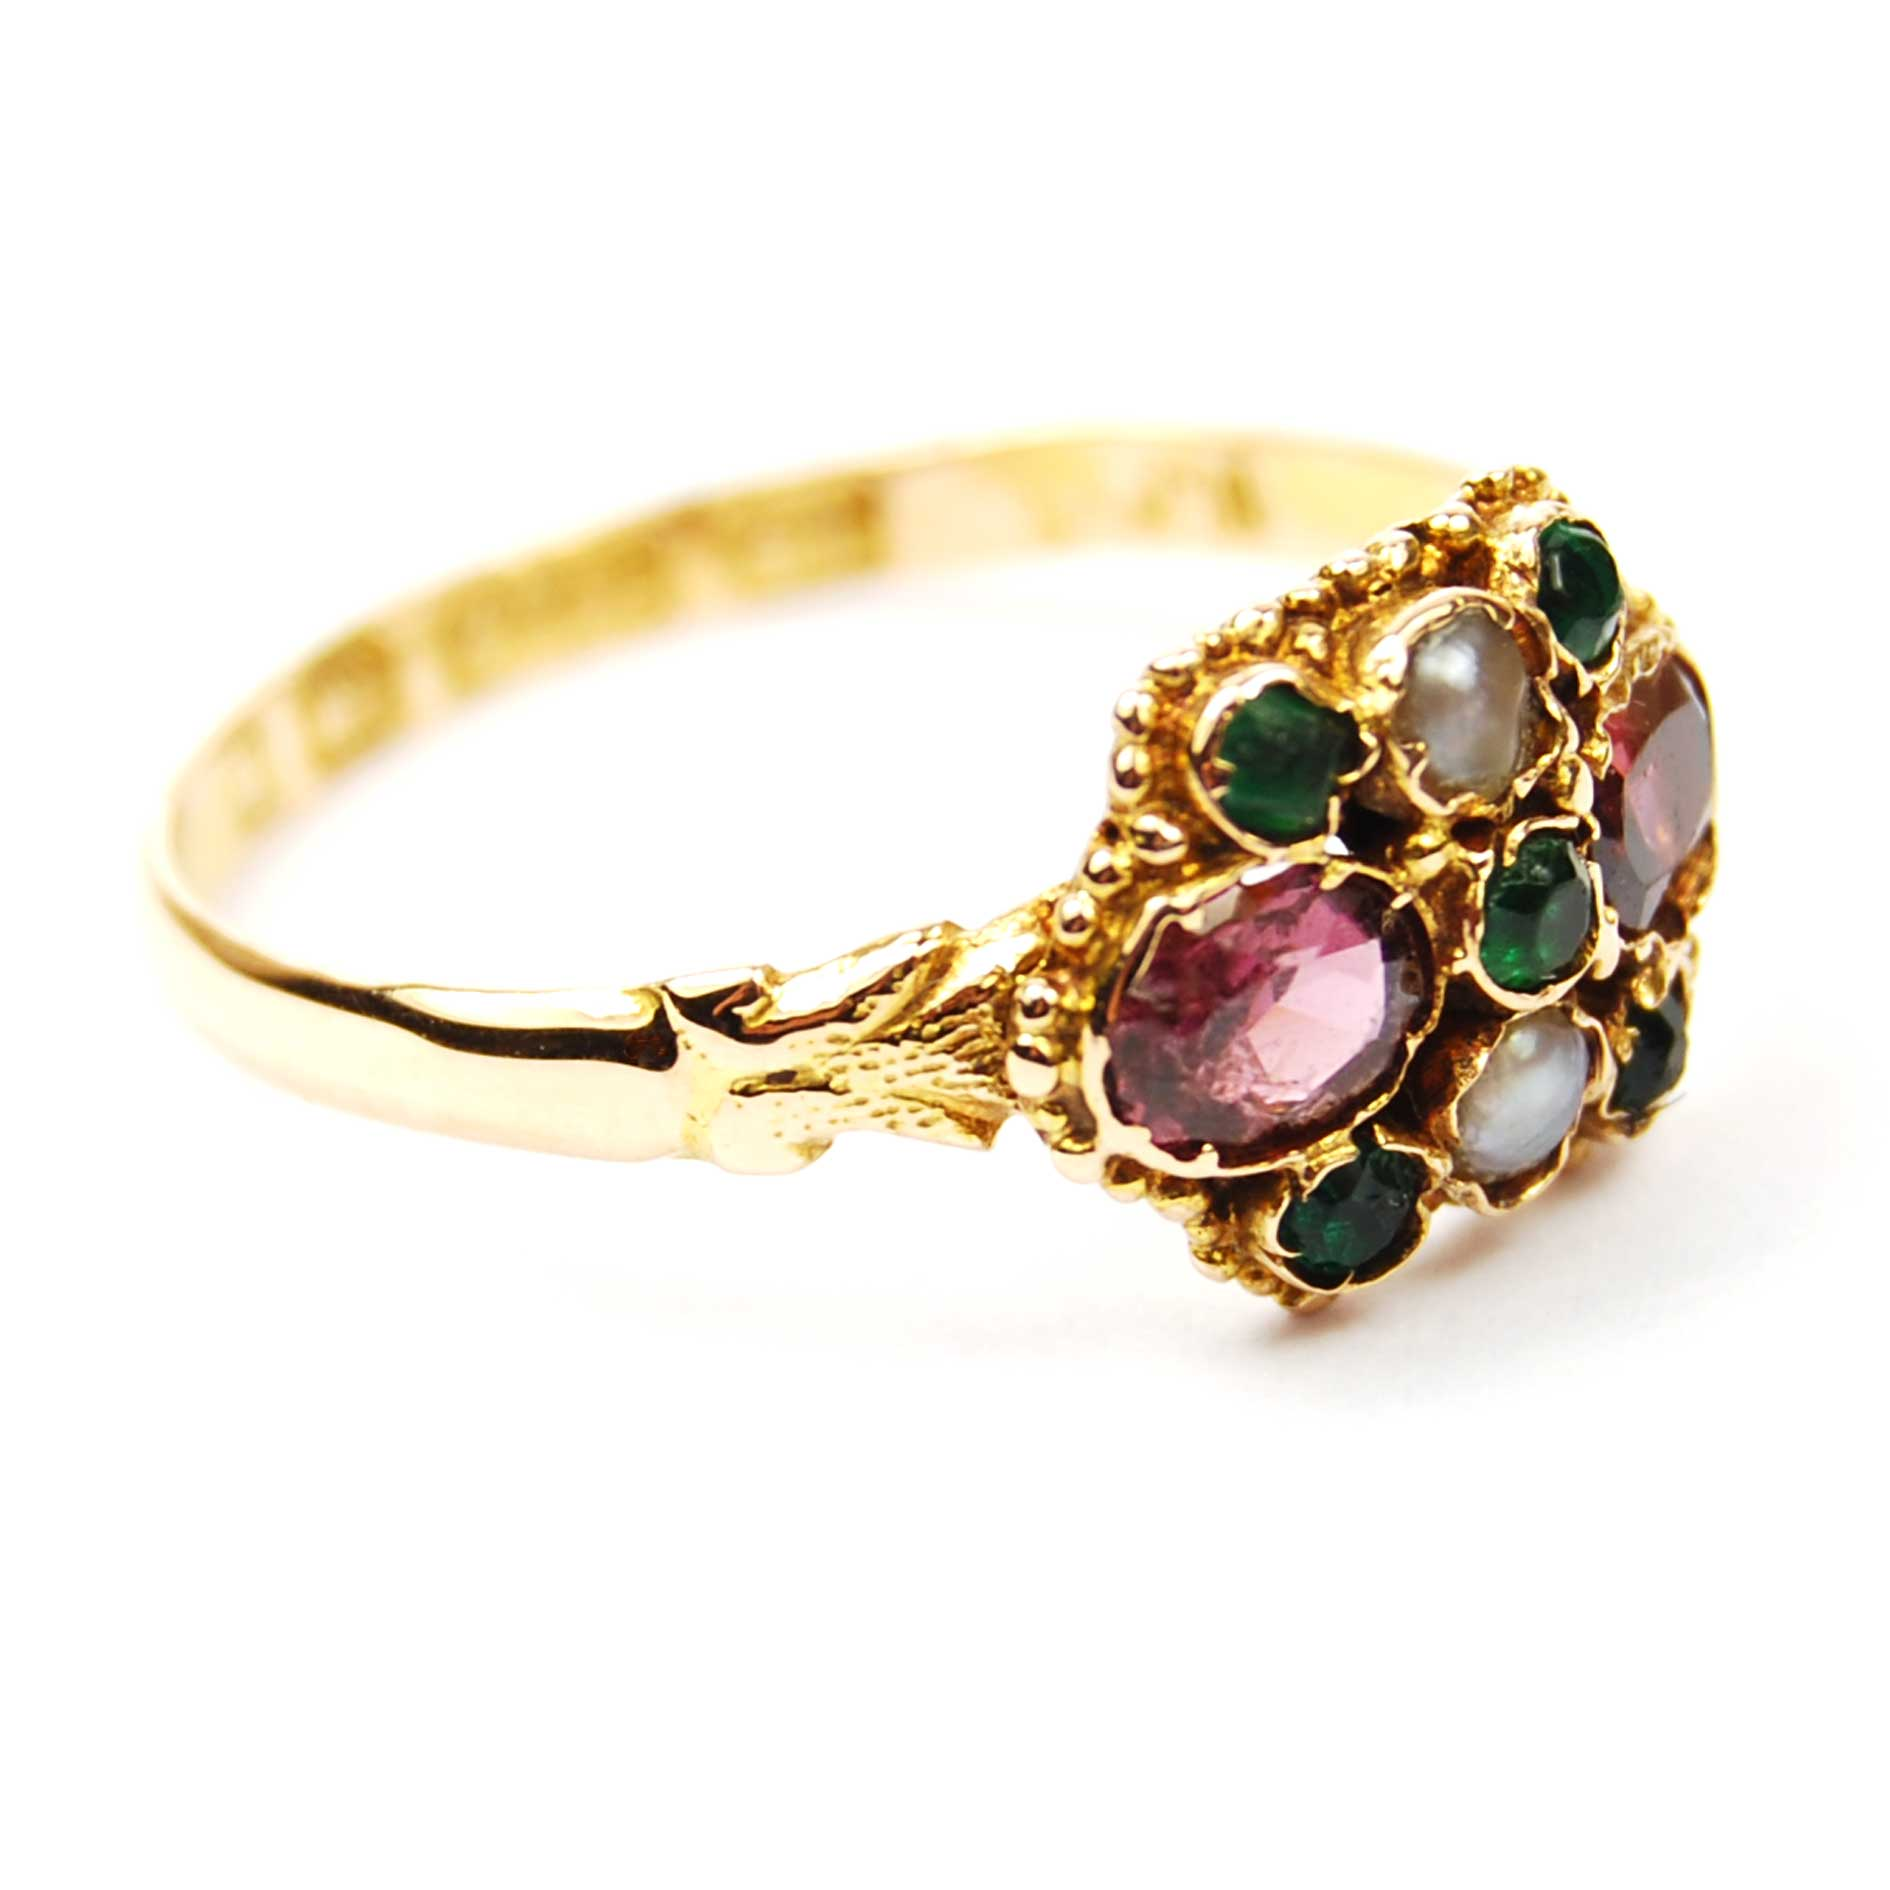 Victorian Almandine Garnet,Emerald & Pearl Ring